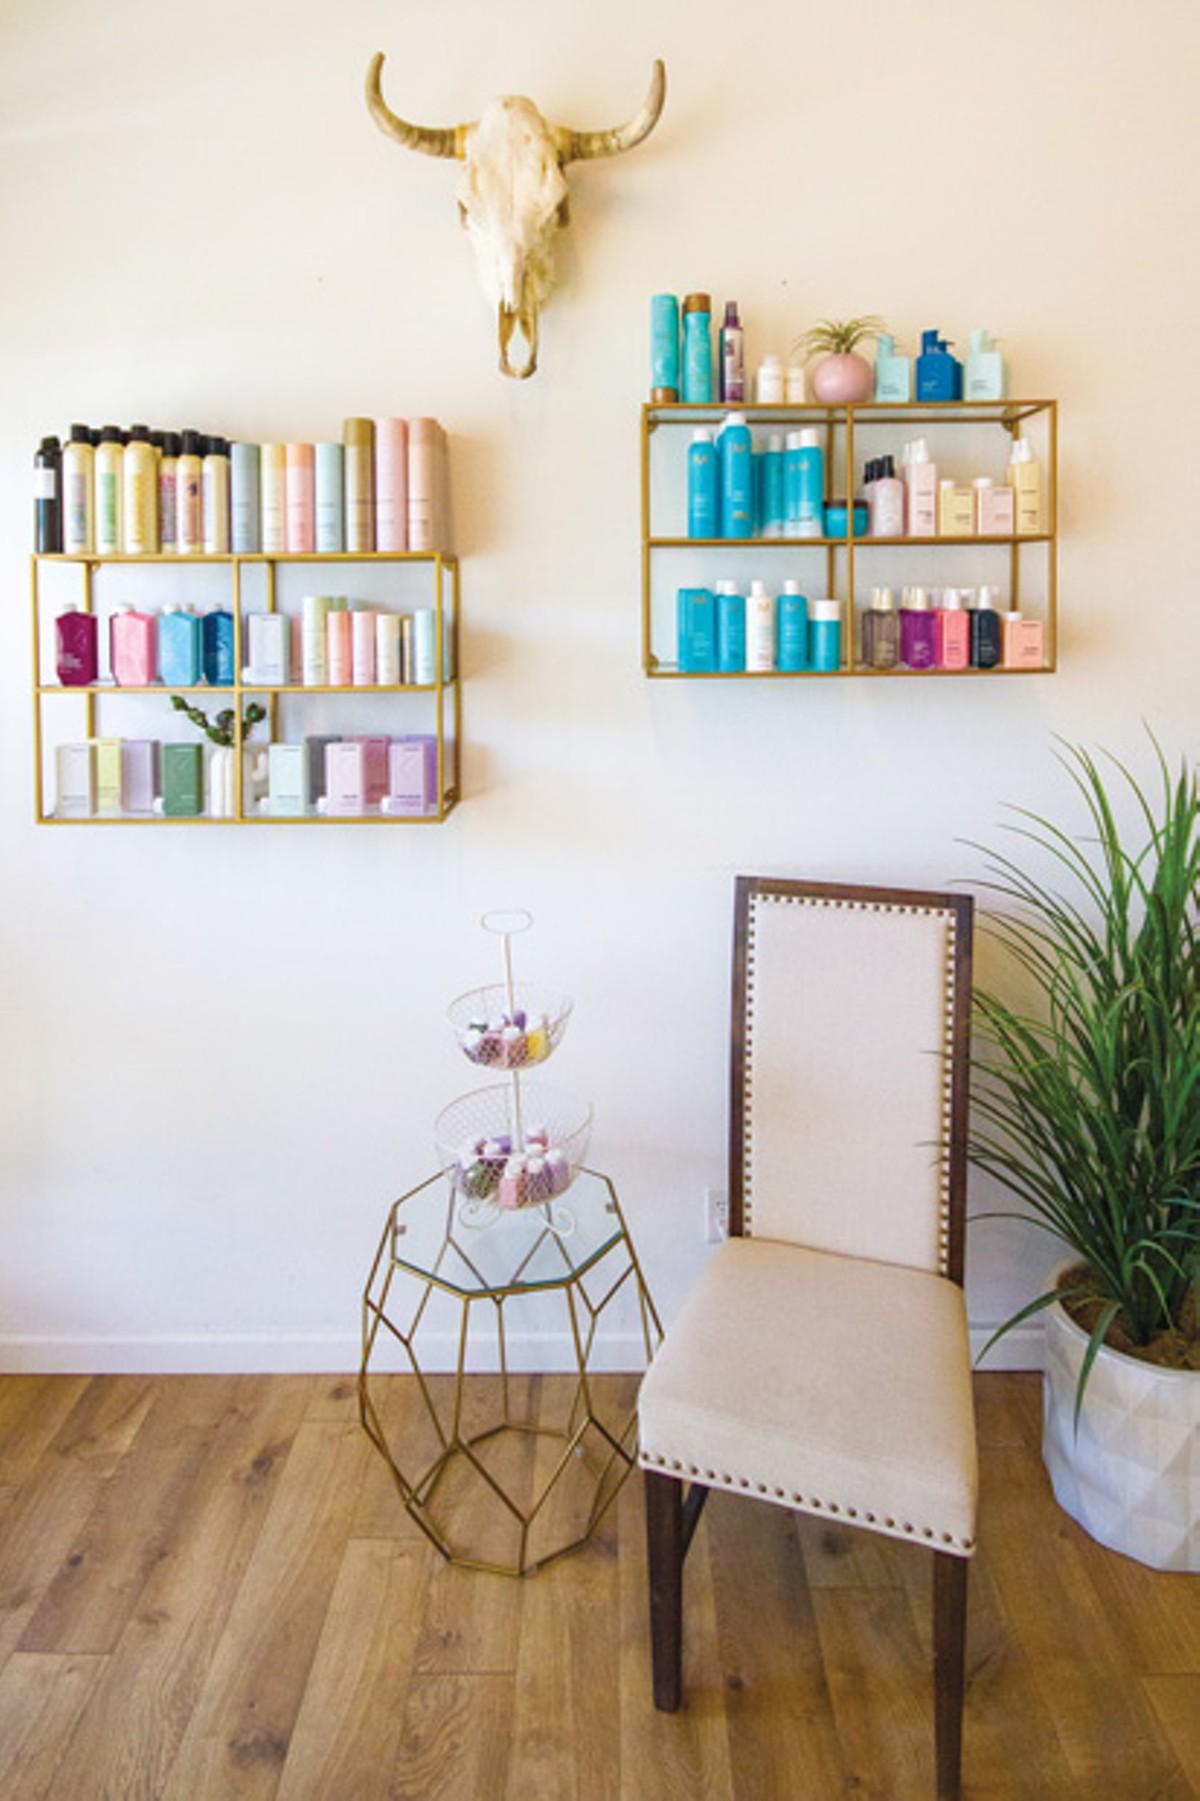 Inside Lush Salon. - DARRIS HURST